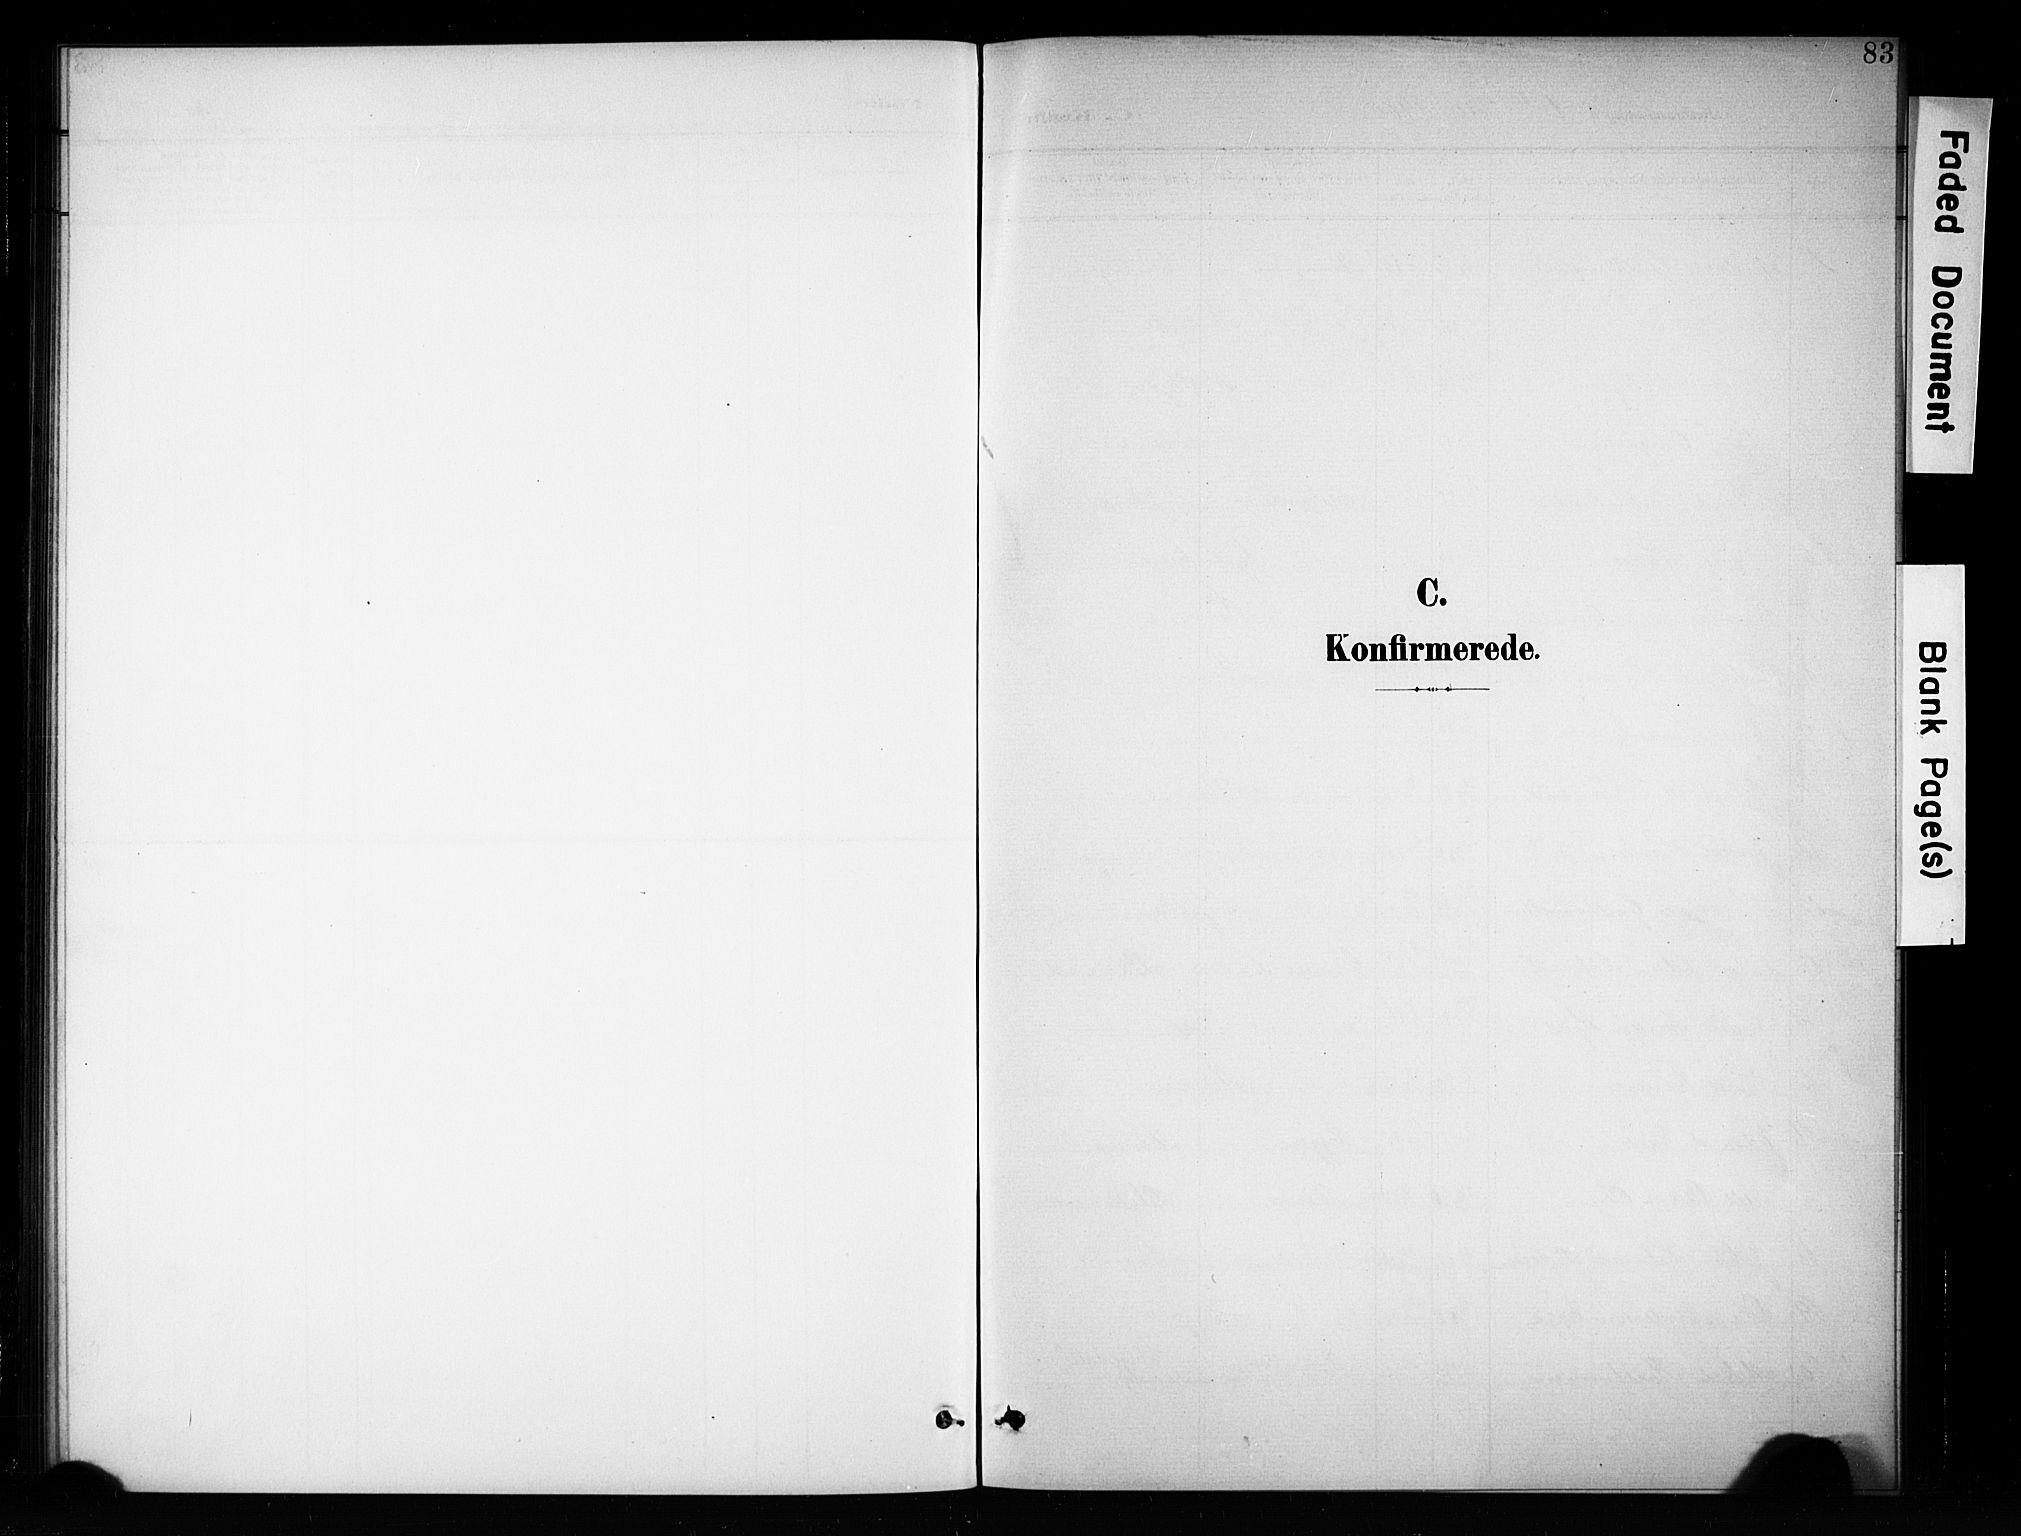 SAH, Brandbu prestekontor, Klokkerbok nr. 5, 1900-1913, s. 83